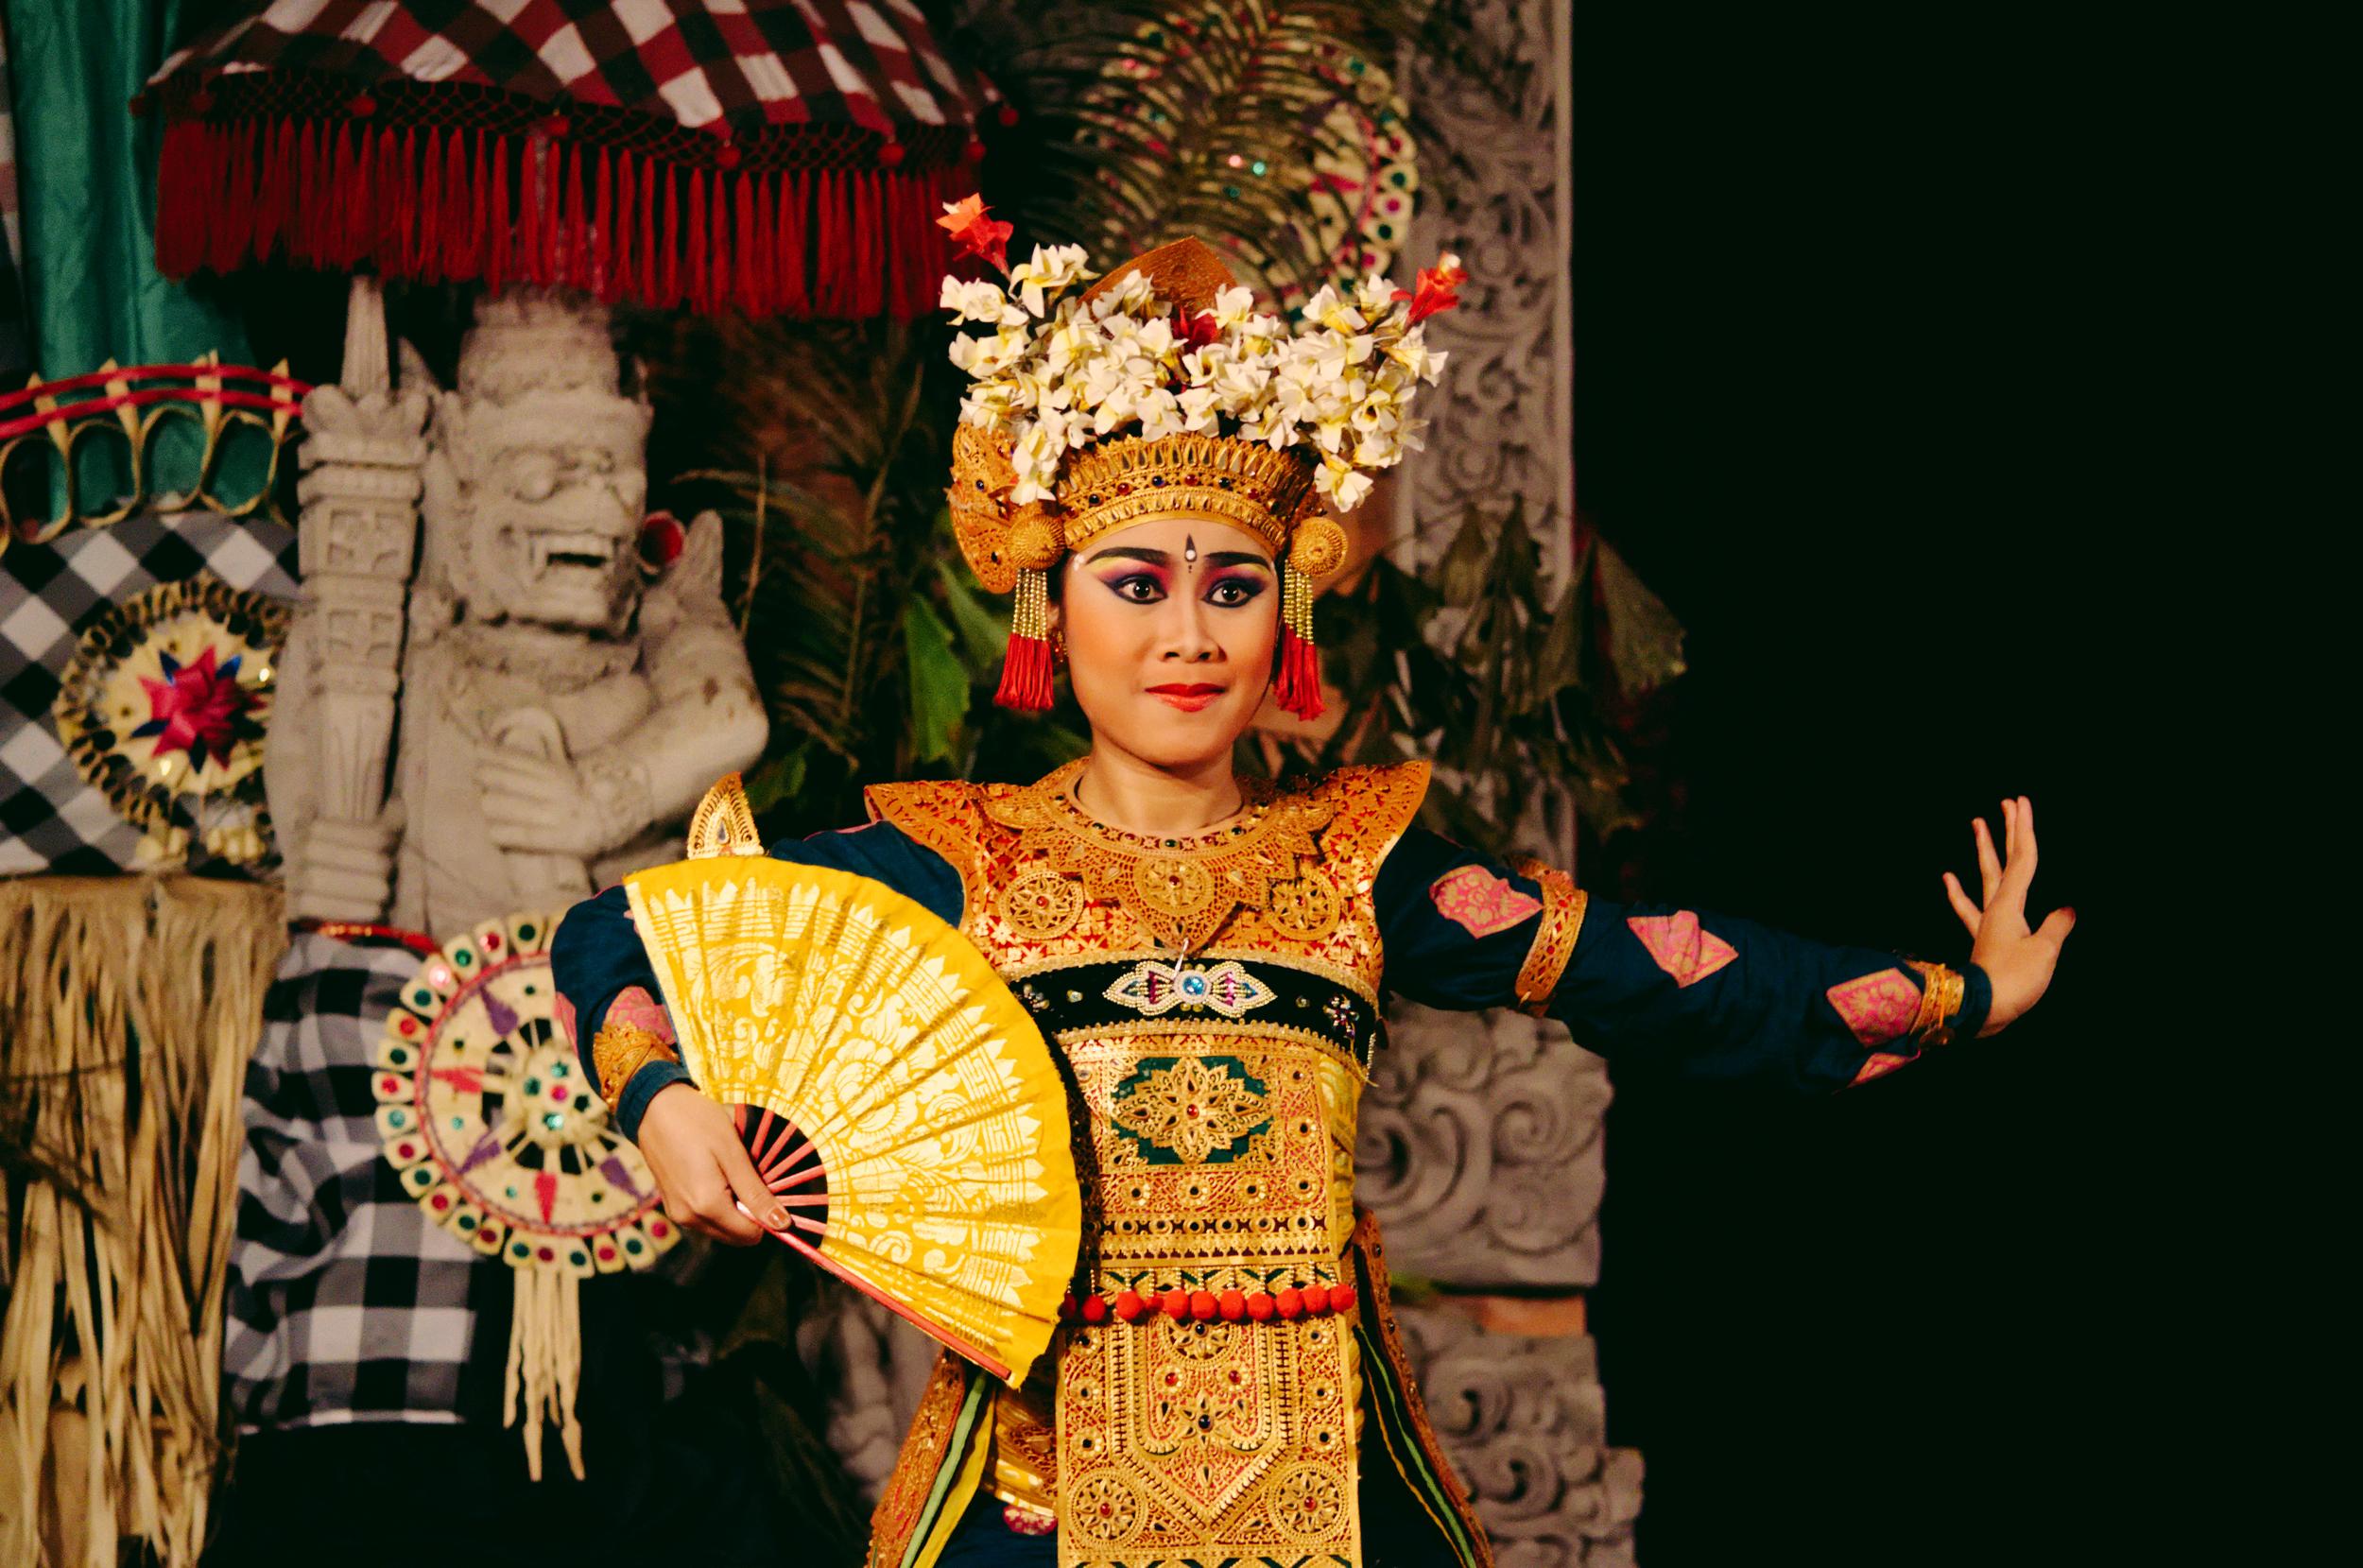 Bali_Lombok_2015-07-09_19h43m52s_1_1573.jpg